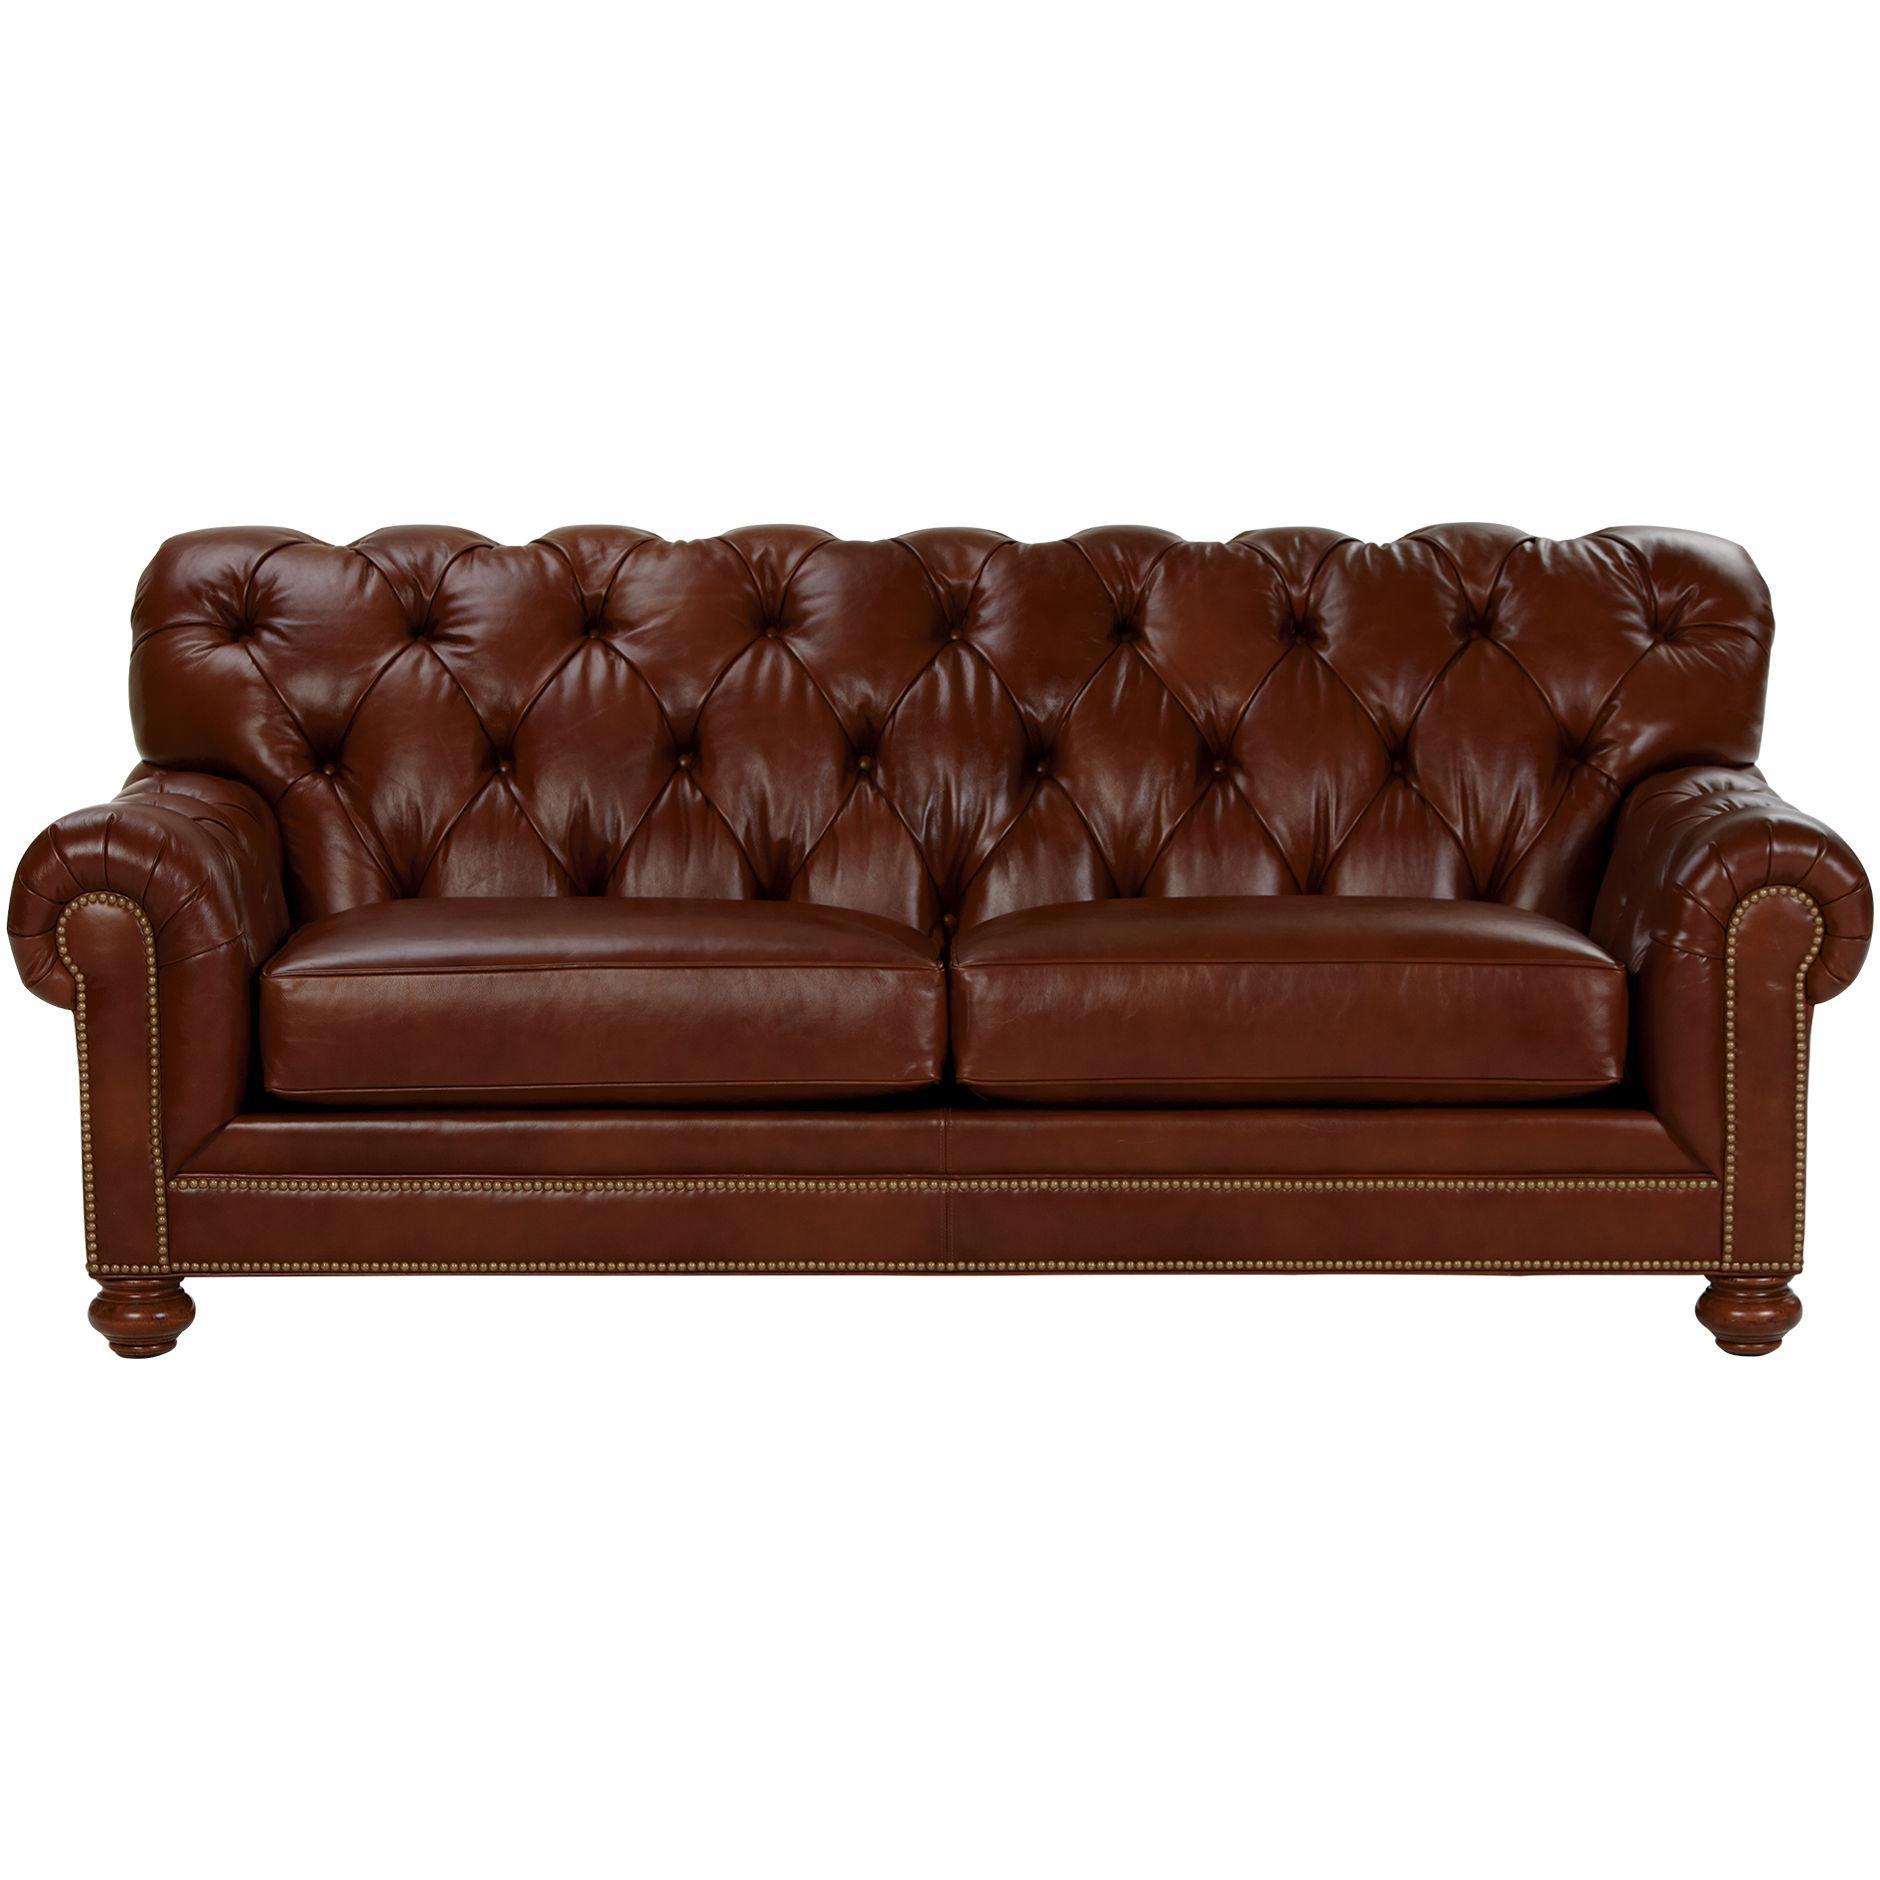 Chadwick Leather Sofa, Old English/ Saddle – Ethan Allen Us | Sofa Inside Chadwick Sofas (Image 5 of 20)